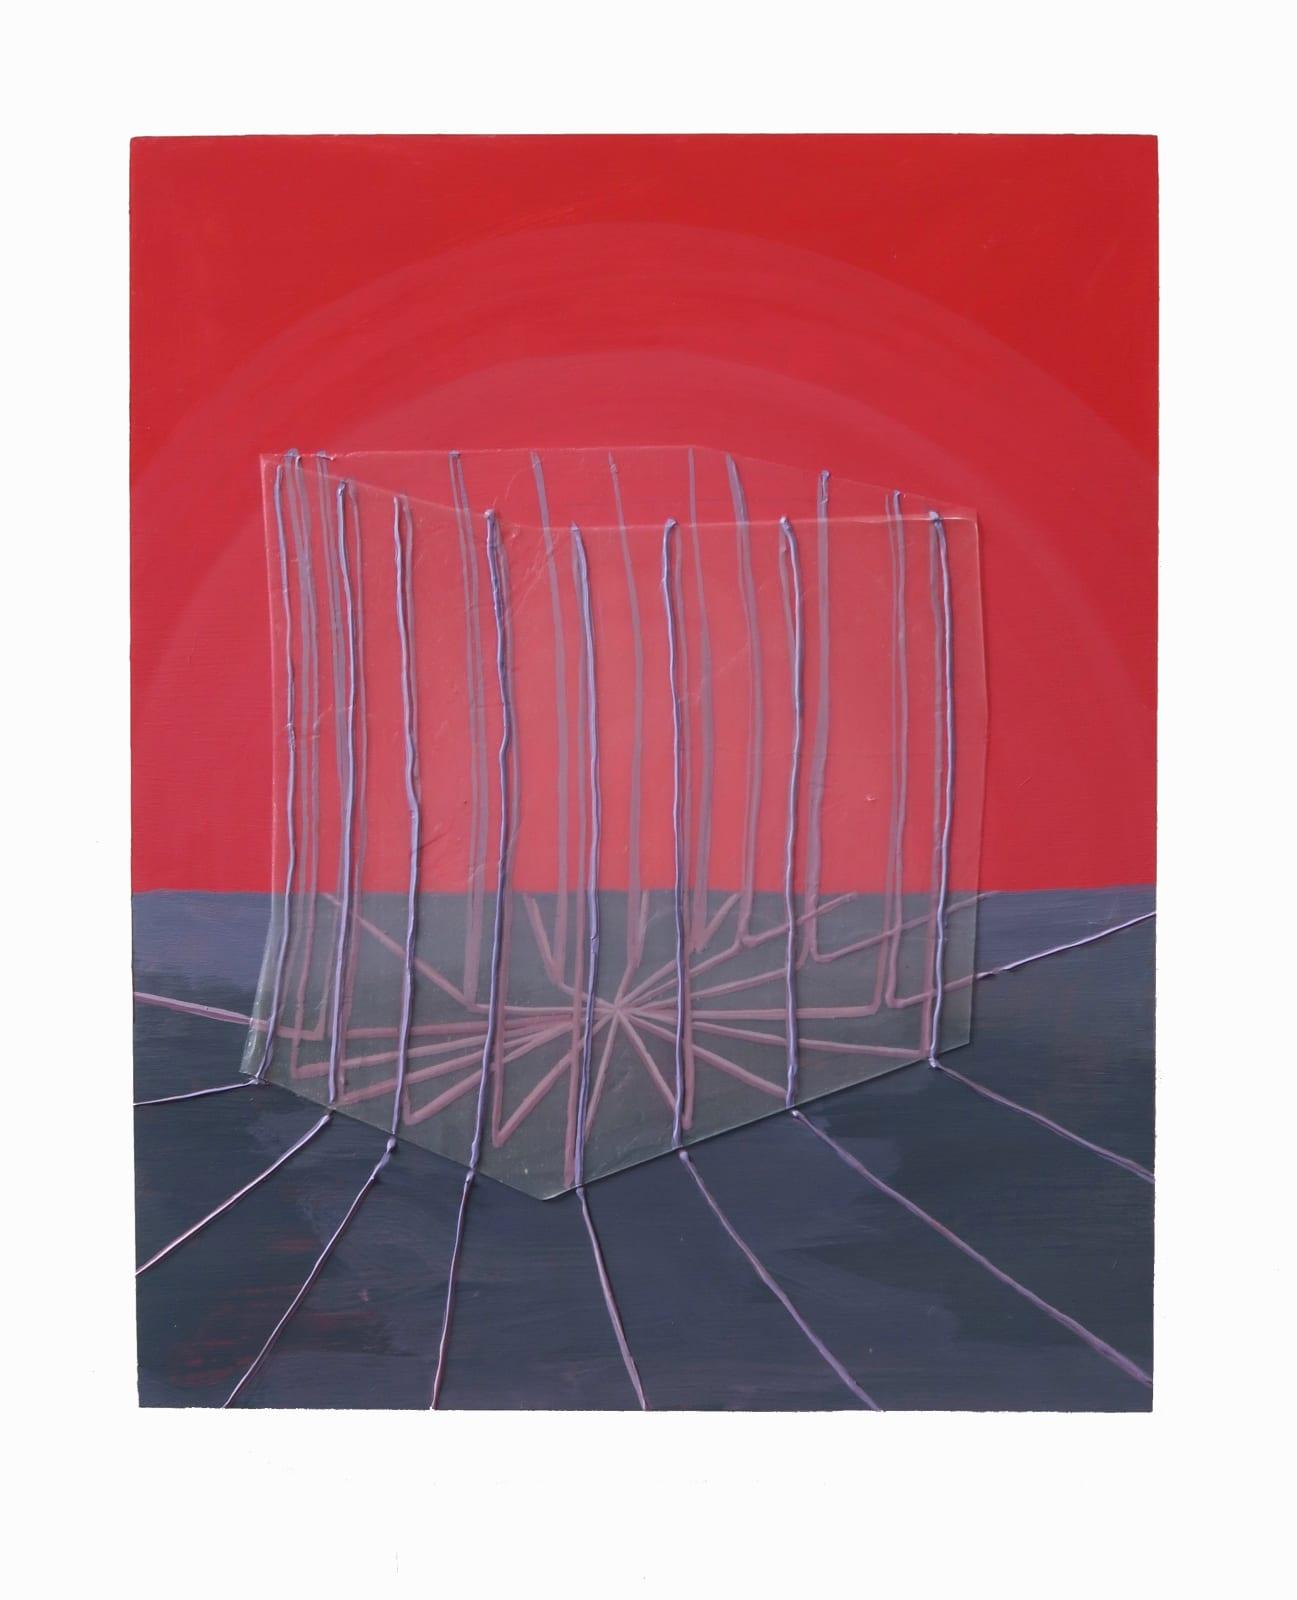 Ricardo Cabret Tu data esta segura, 2021 Polymers and acrylic on panel 16 x 20 in 40.6 x 50.8 cm